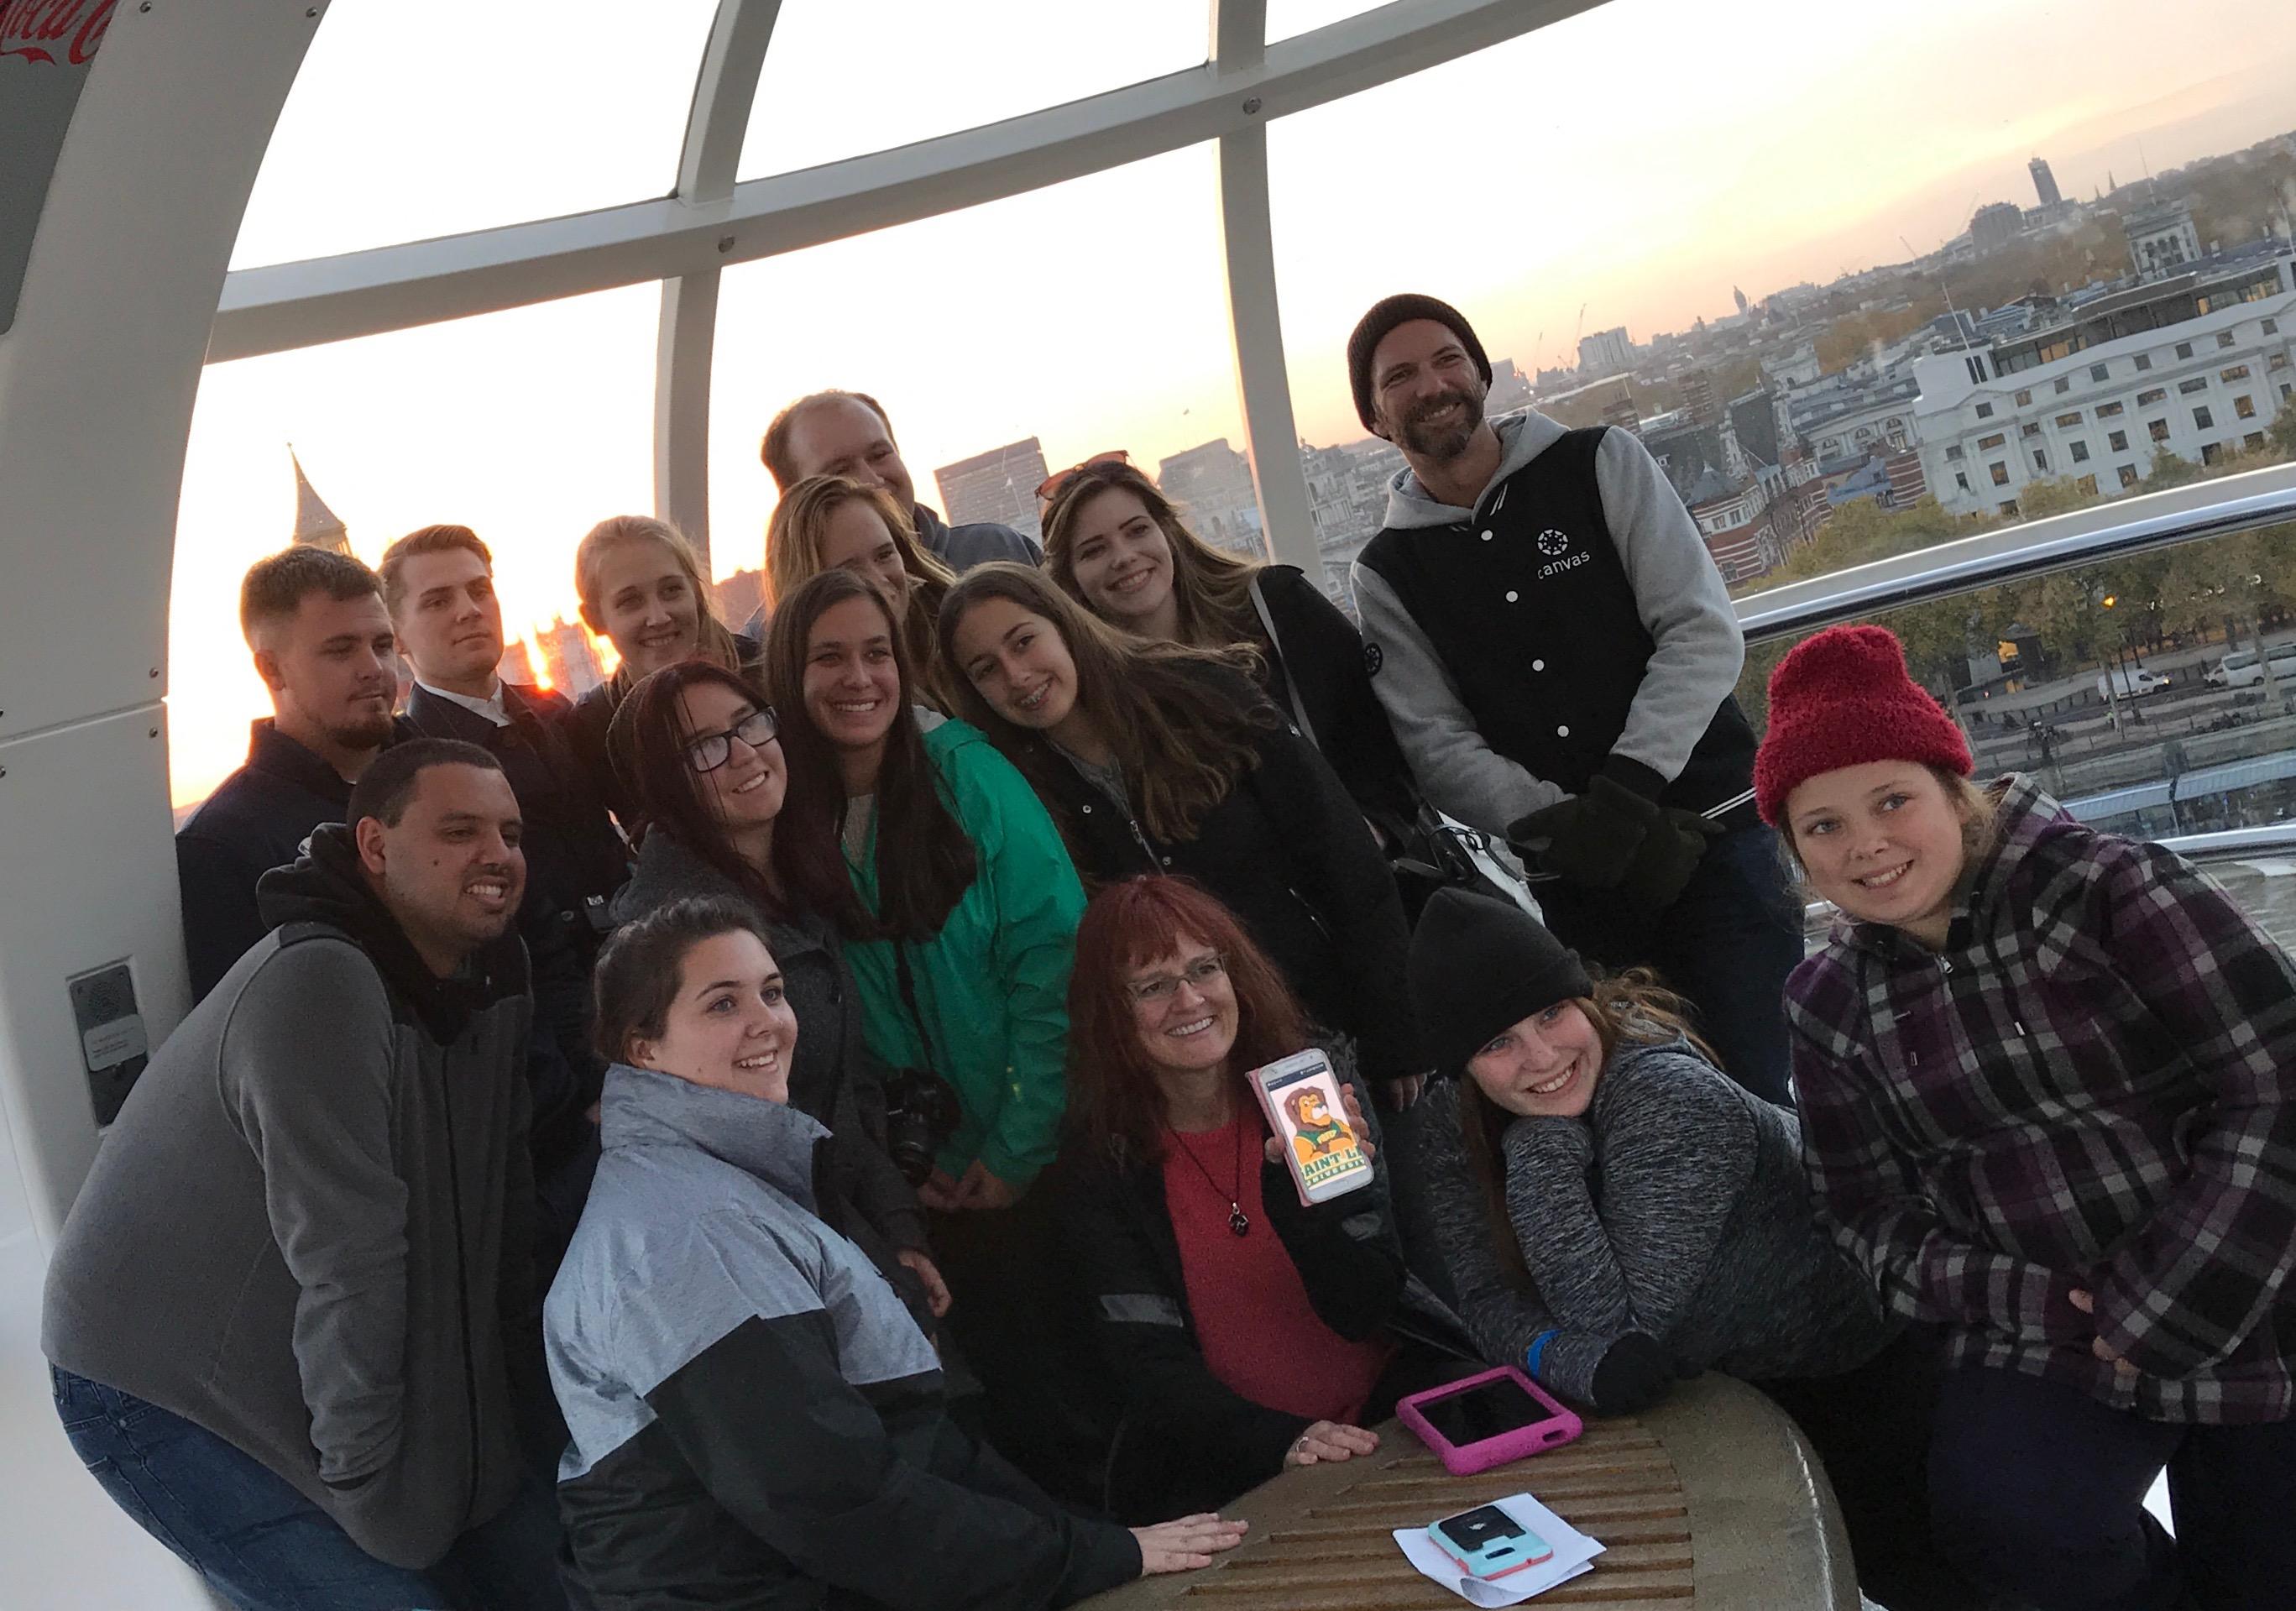 Students in Saint Leo University's Harry Potter class in Europe